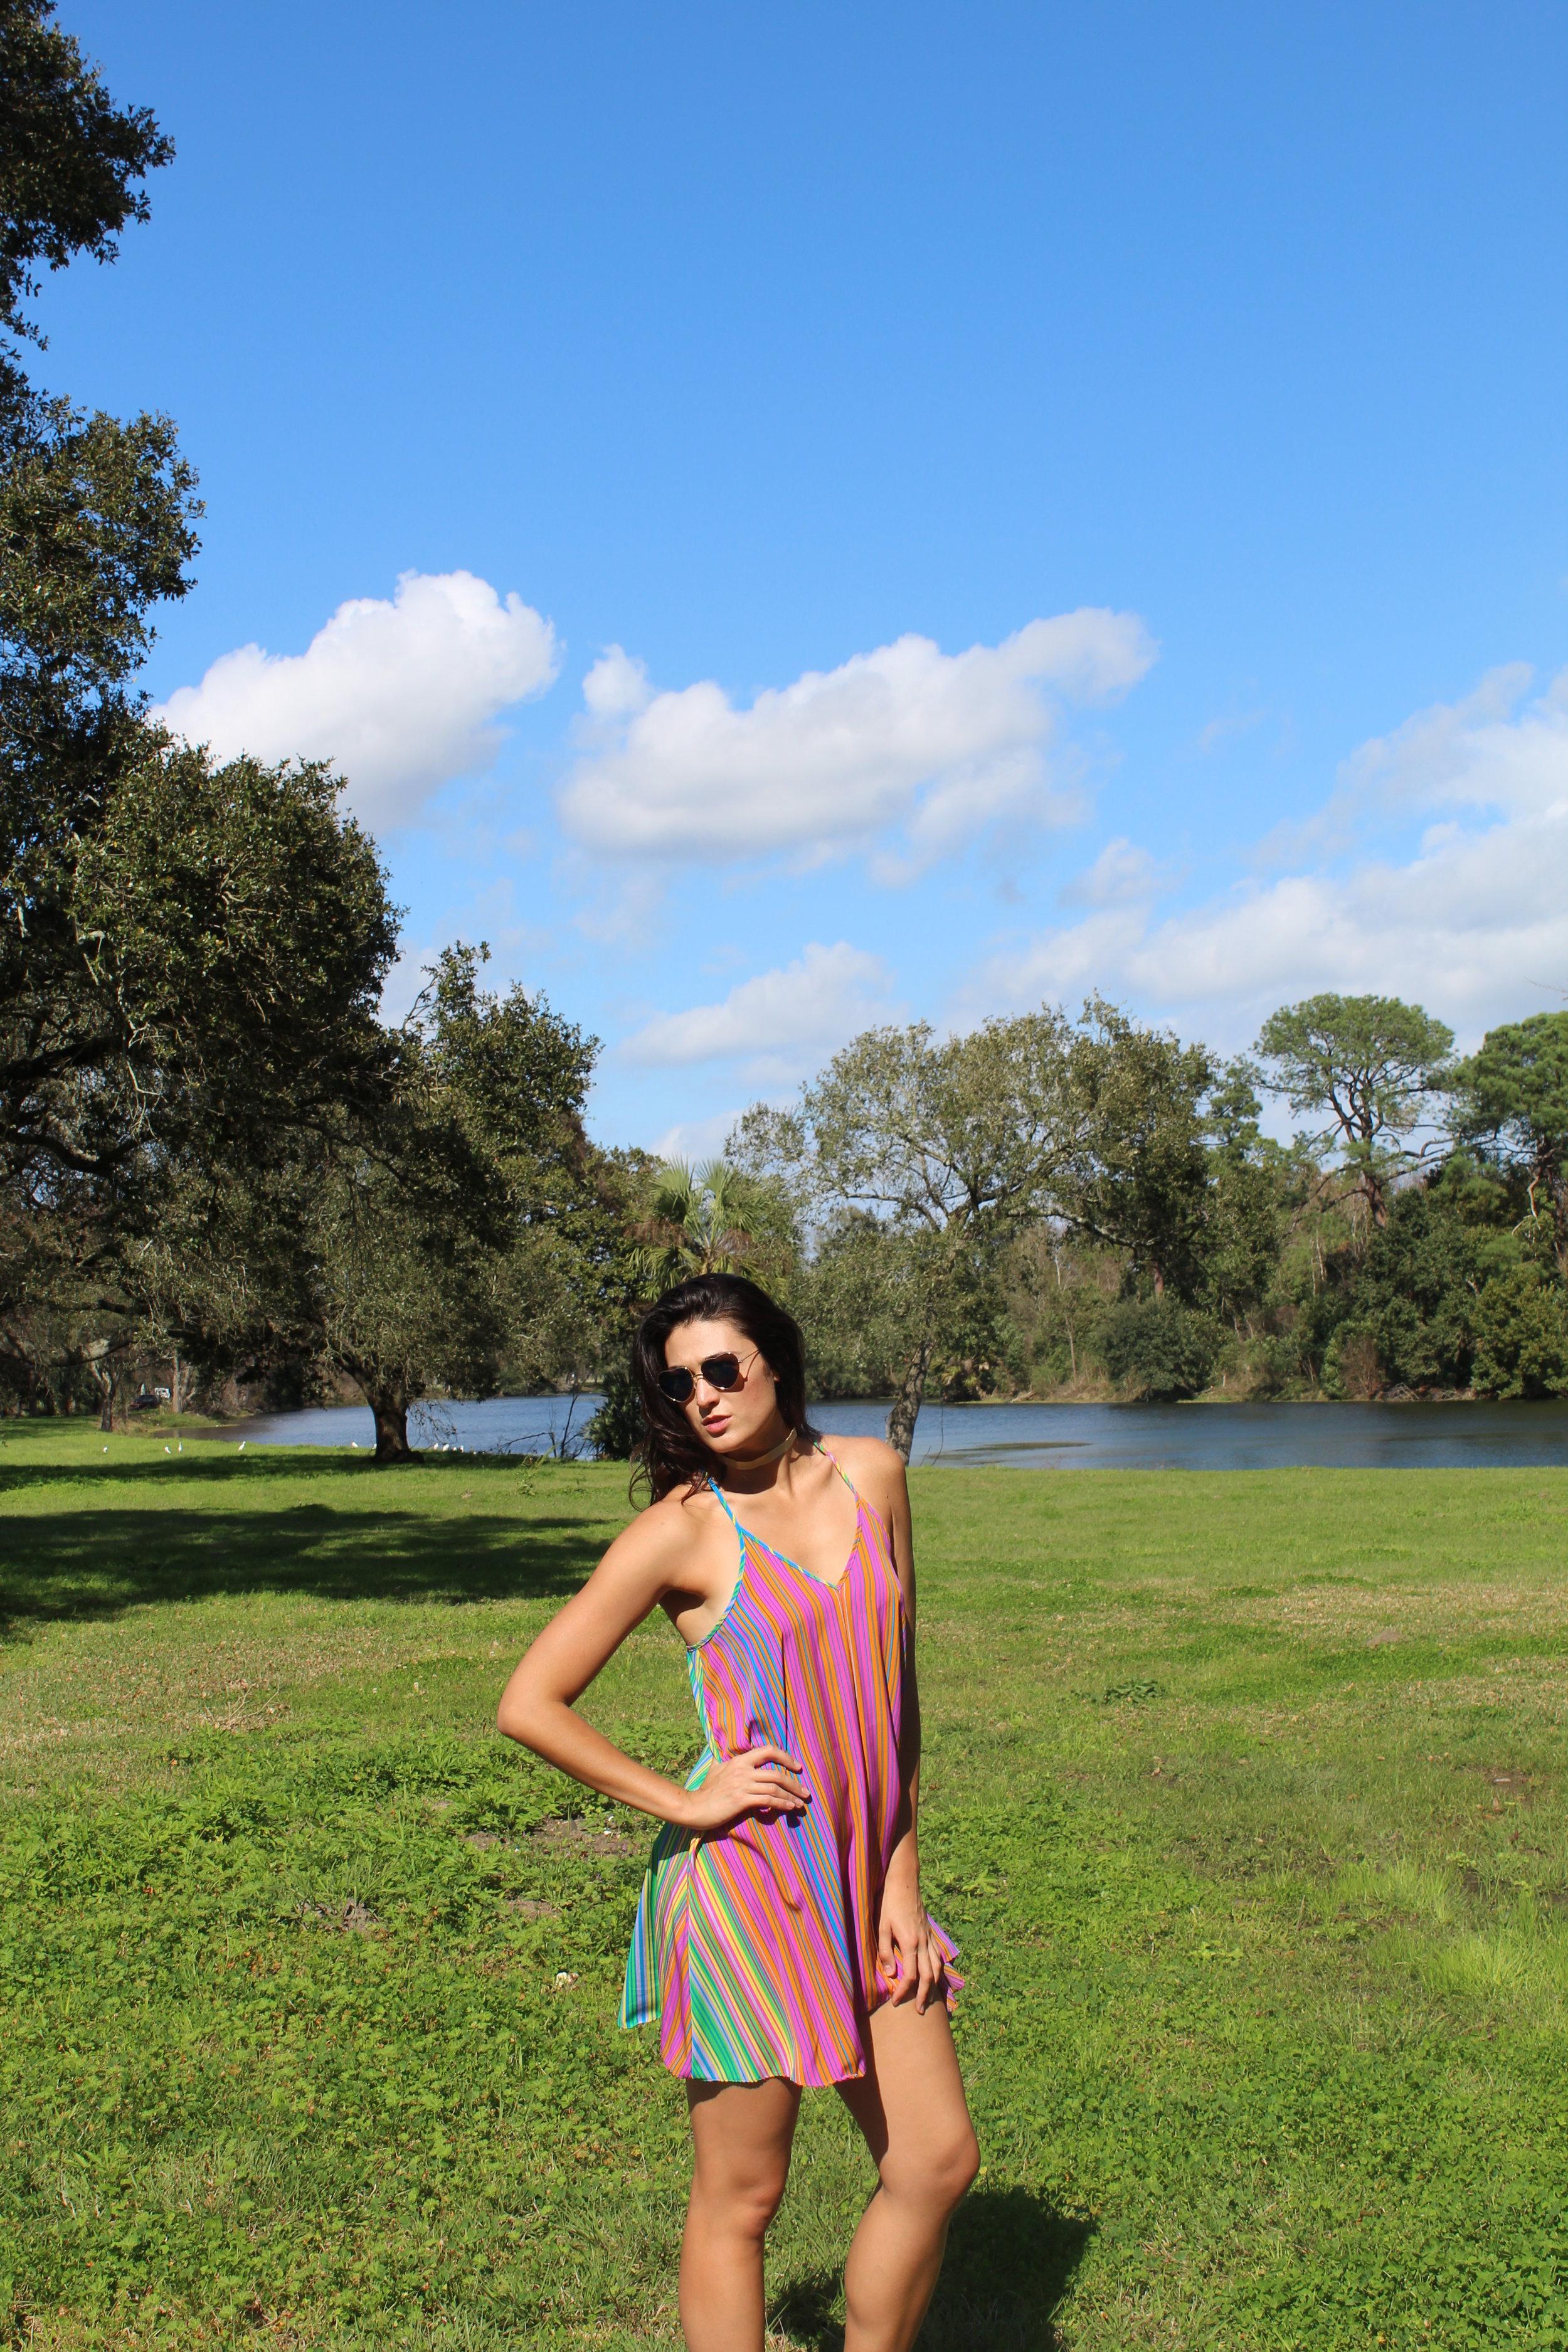 LE TOTE - Au Amanda Uprichard  Multi Stripe Dress $54 & Noir Luxe  Mesh Gold Choker $13